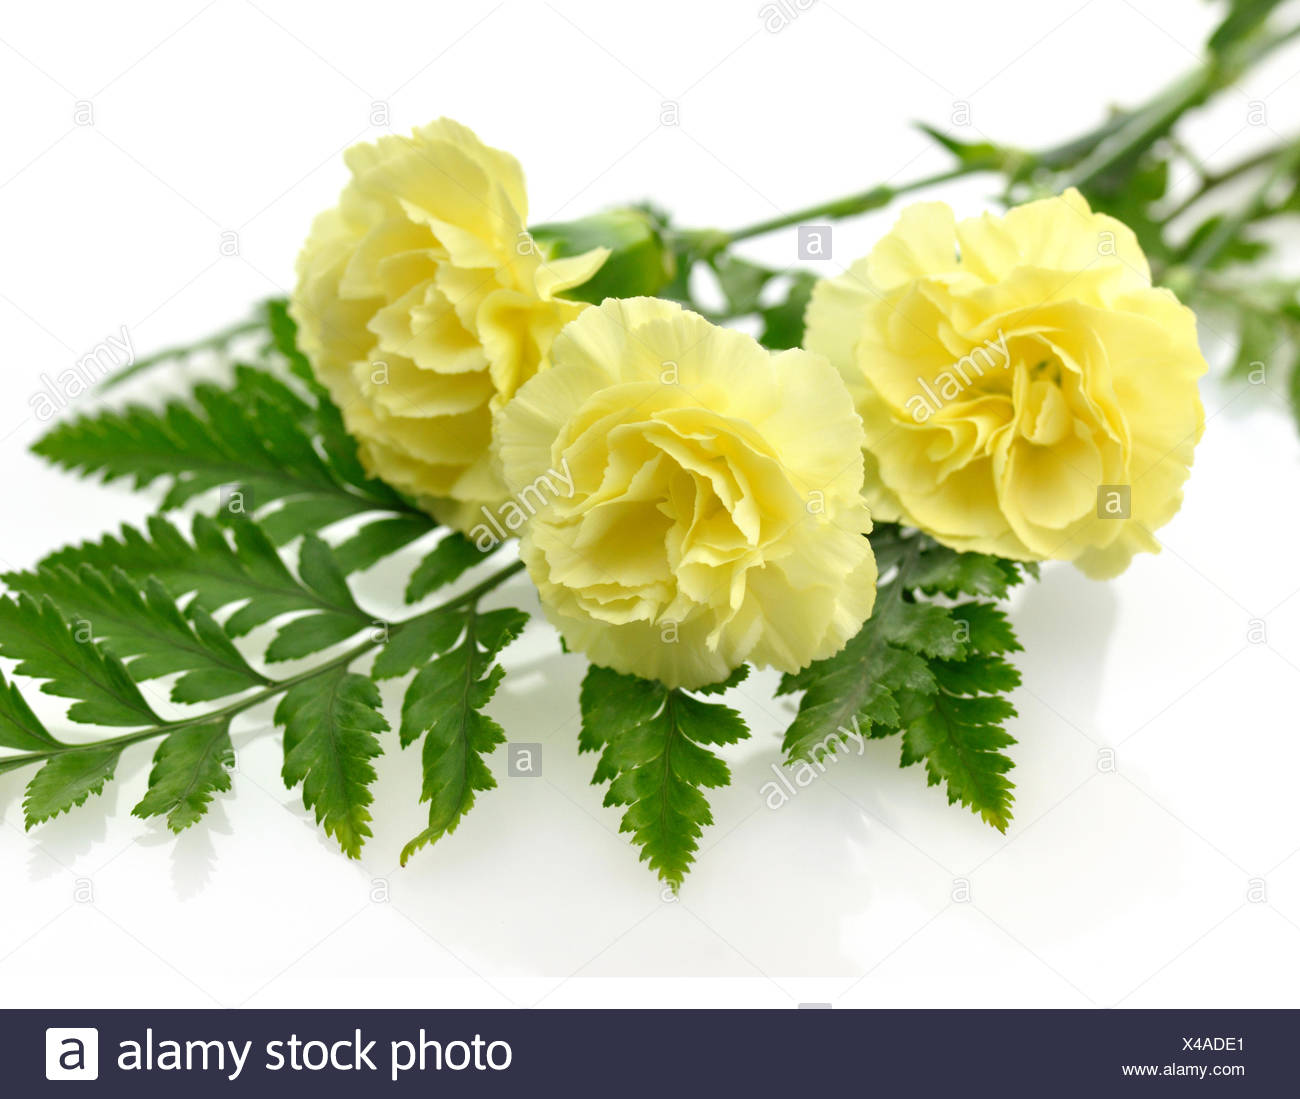 Yellow carnation flowers stock photo 278054617 alamy yellow carnation flowers mightylinksfo